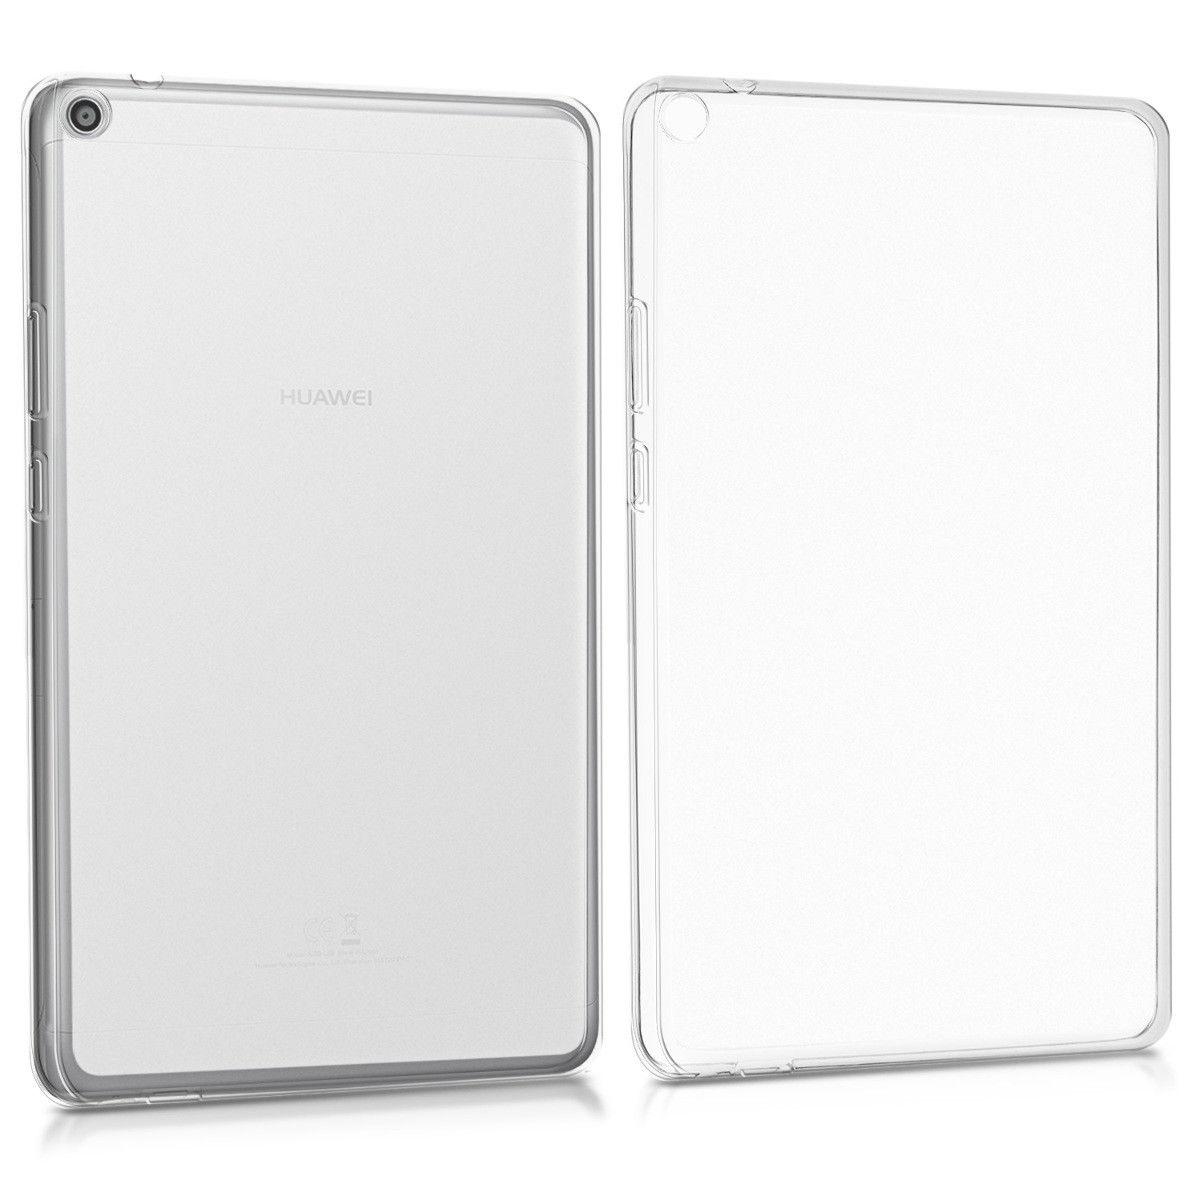 Pouzdro GEL pro Huawei MediaPad T3 8.0